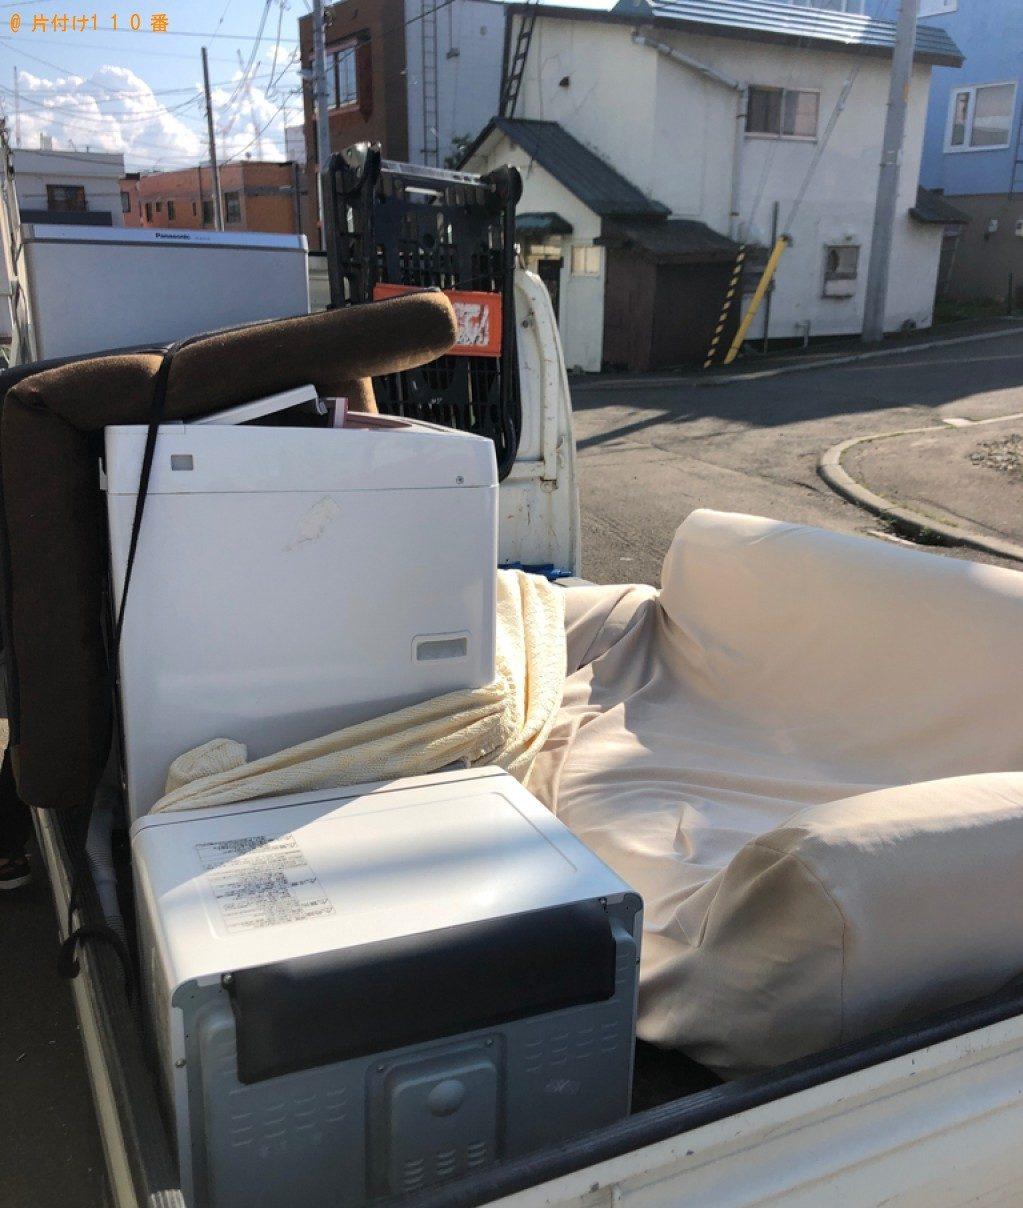 【檜枝岐村】洗濯機、ソファー、小型家電等の回収・処分ご依頼